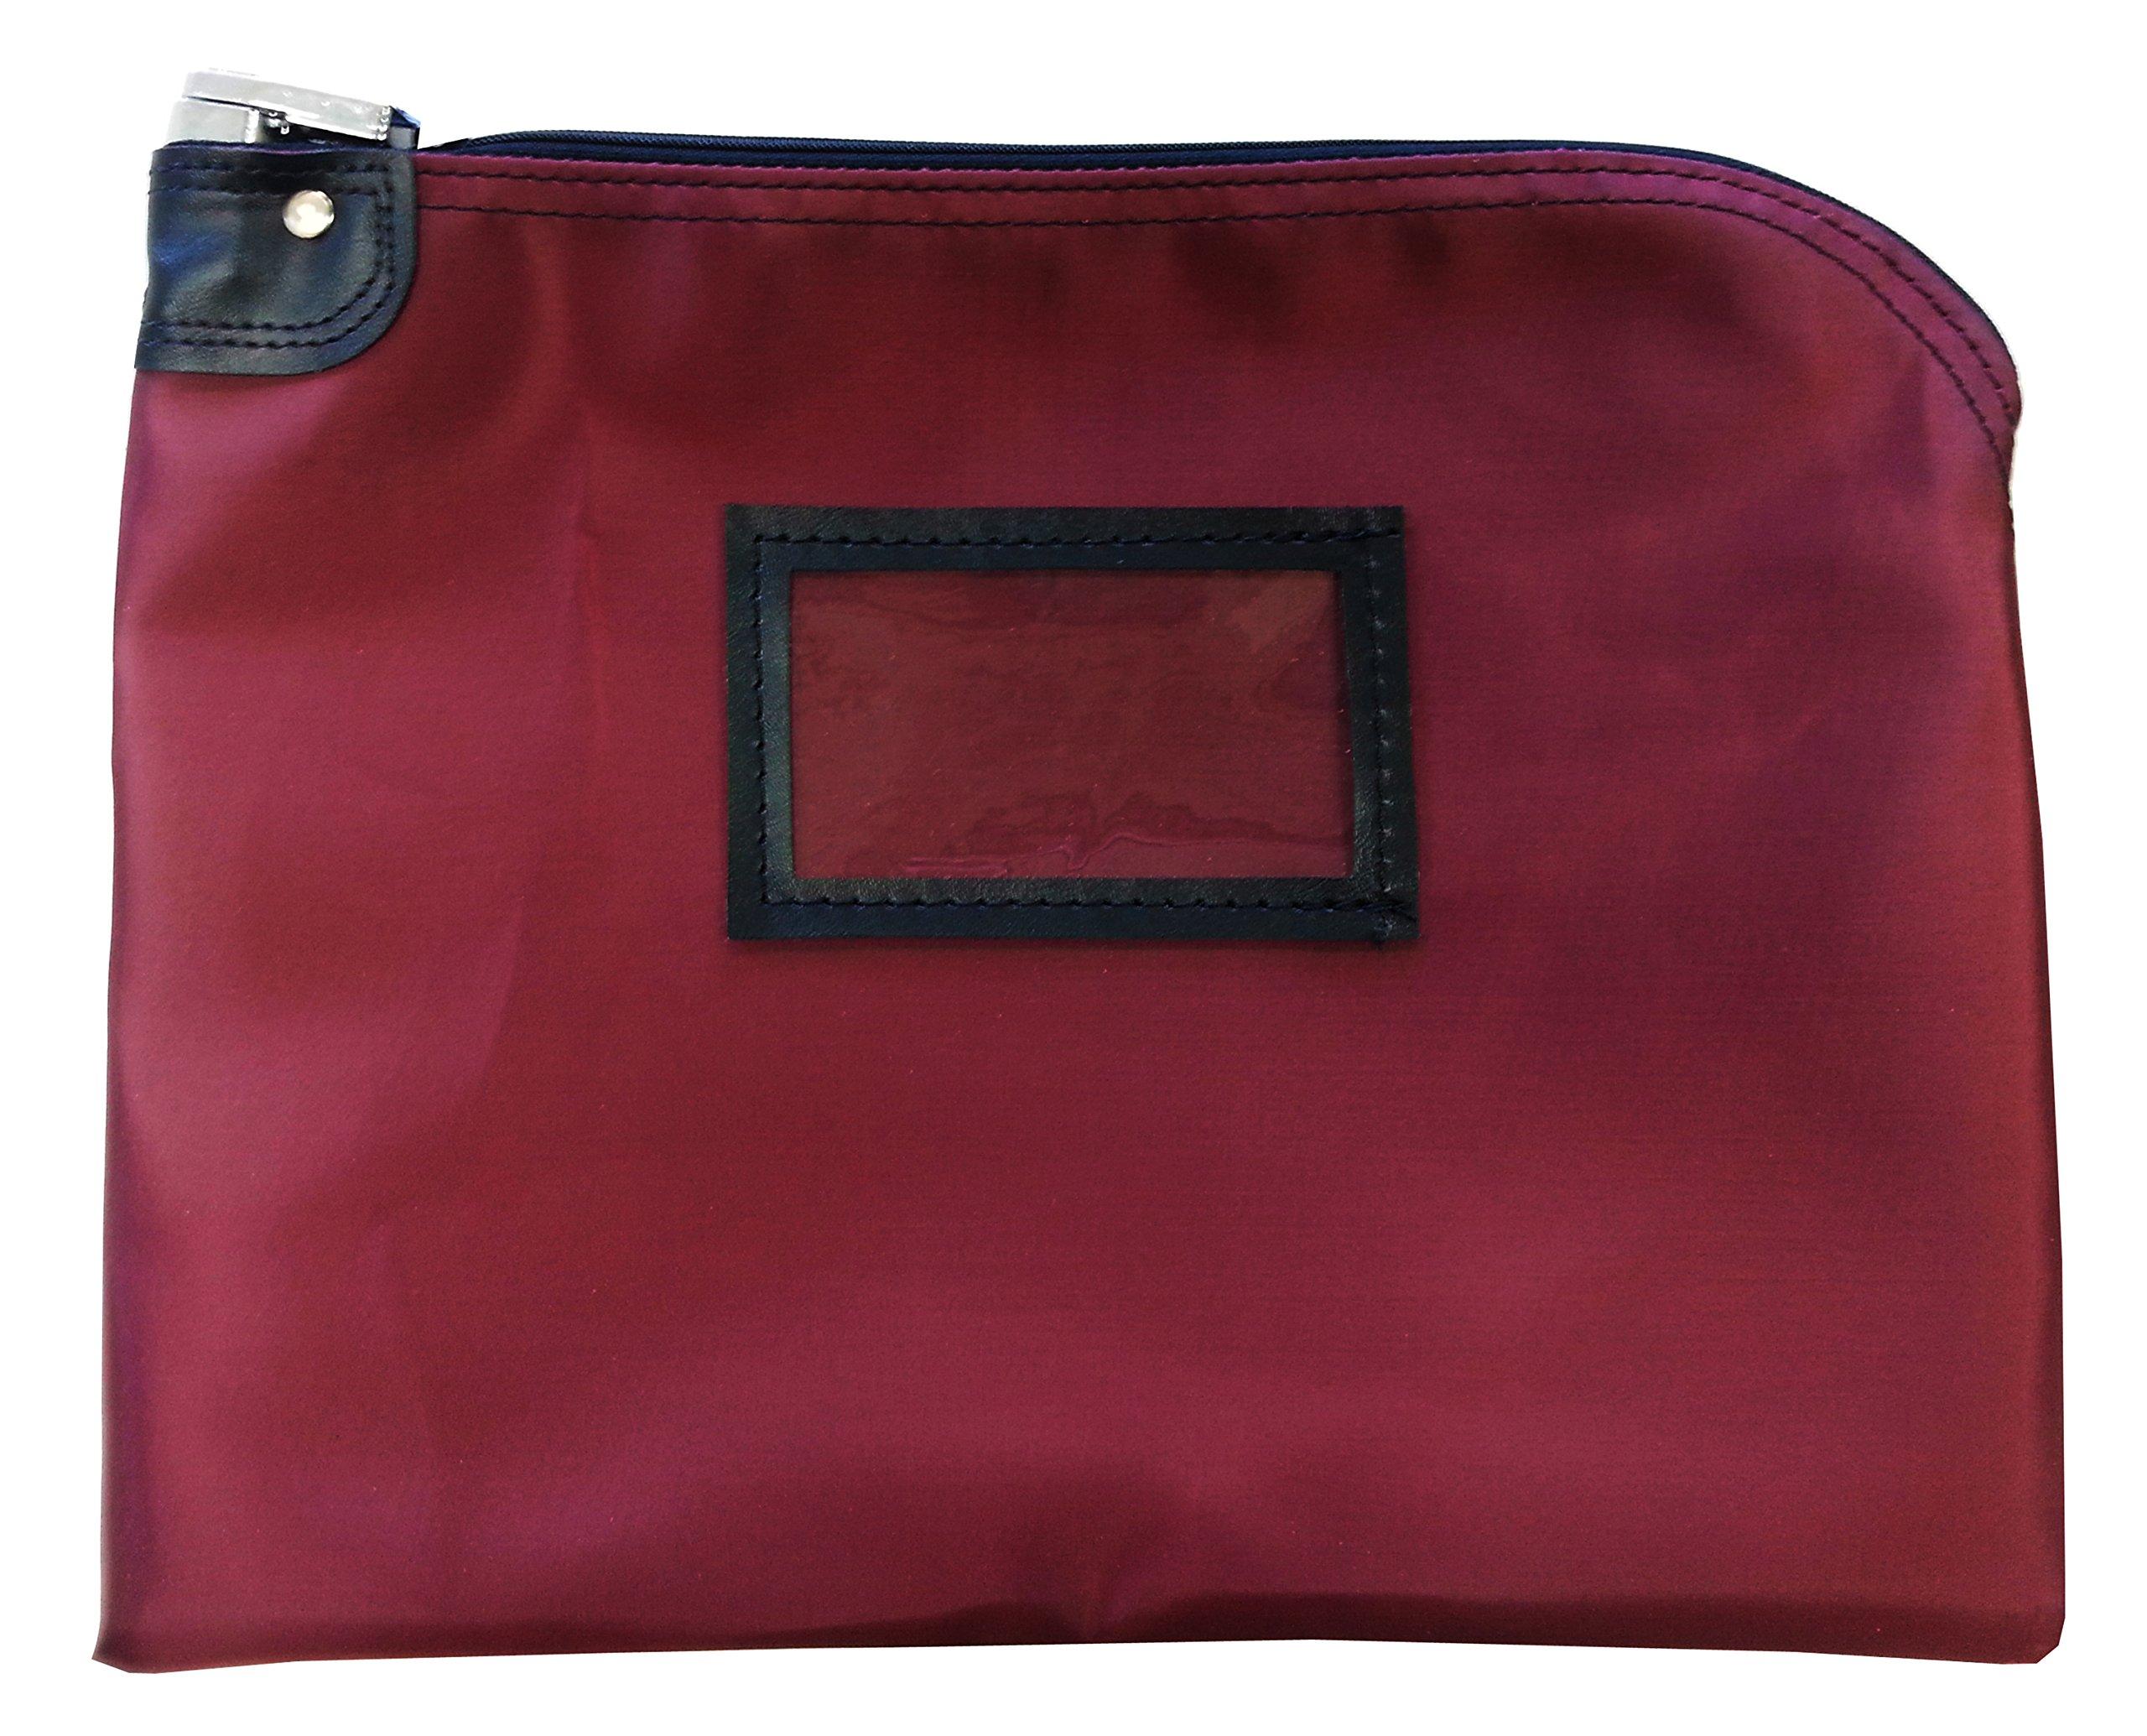 Locking Document Security HIPAA Bag 11 x 15 (Burgundy)